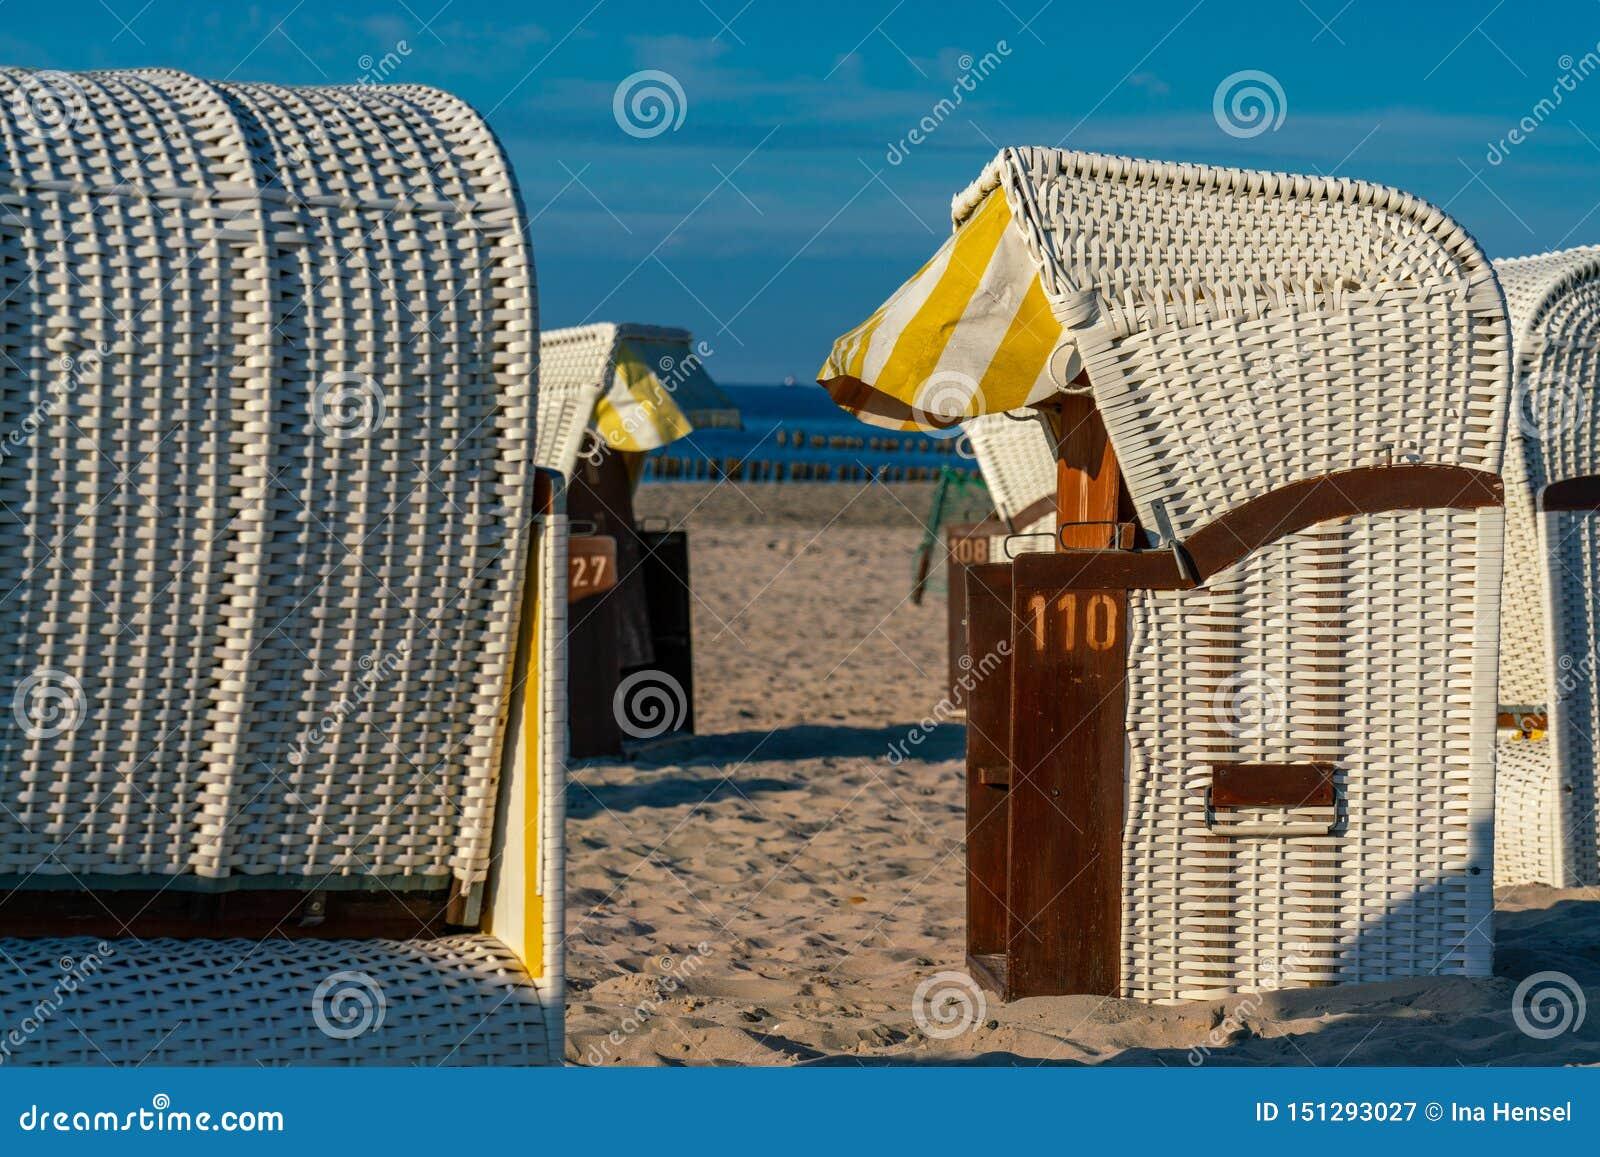 O branco telhou cadeiras de praia de vime na luz solar dourada